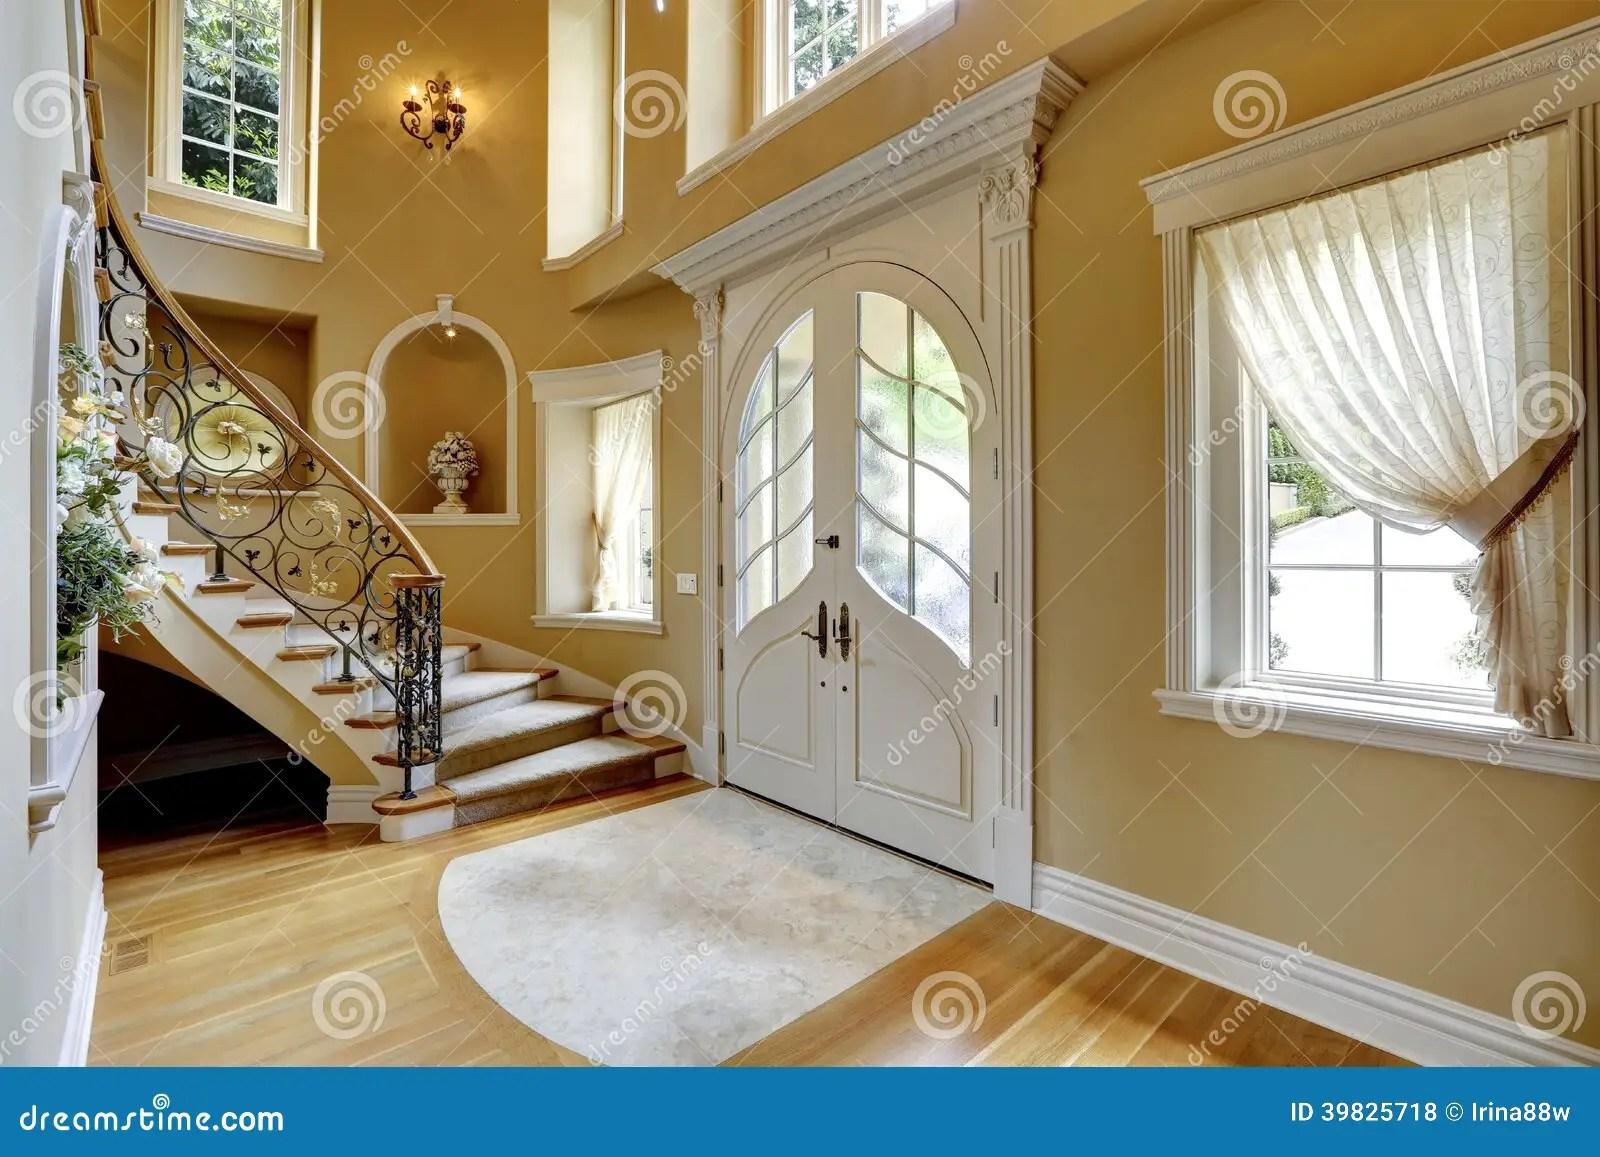 Intrieur De Luxe De Maison Couloir Dentre Photo Stock